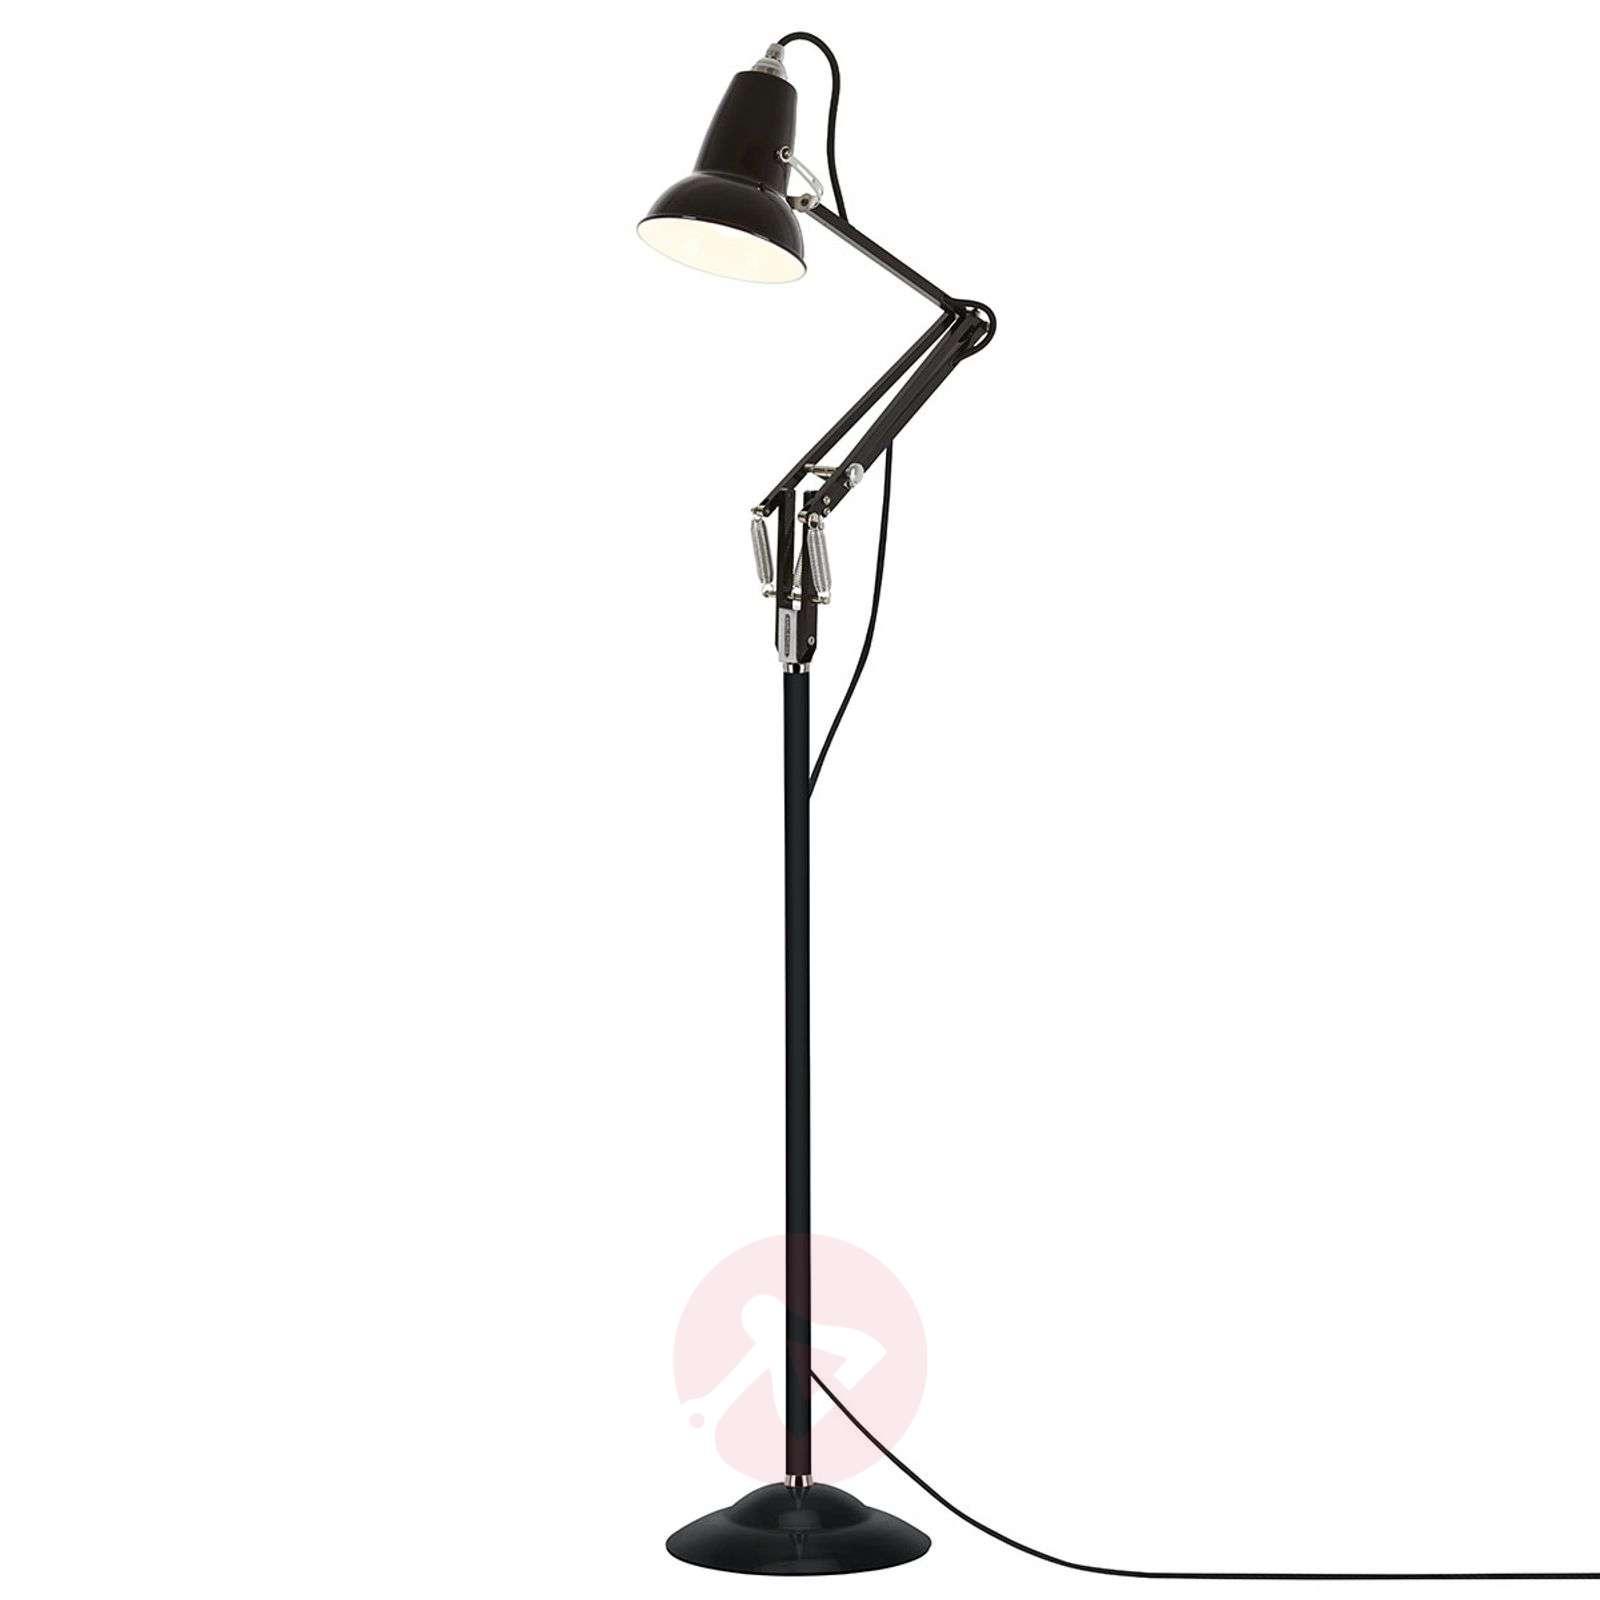 Anglepoise Original 1227 Mini floor lamp-1073067X-01